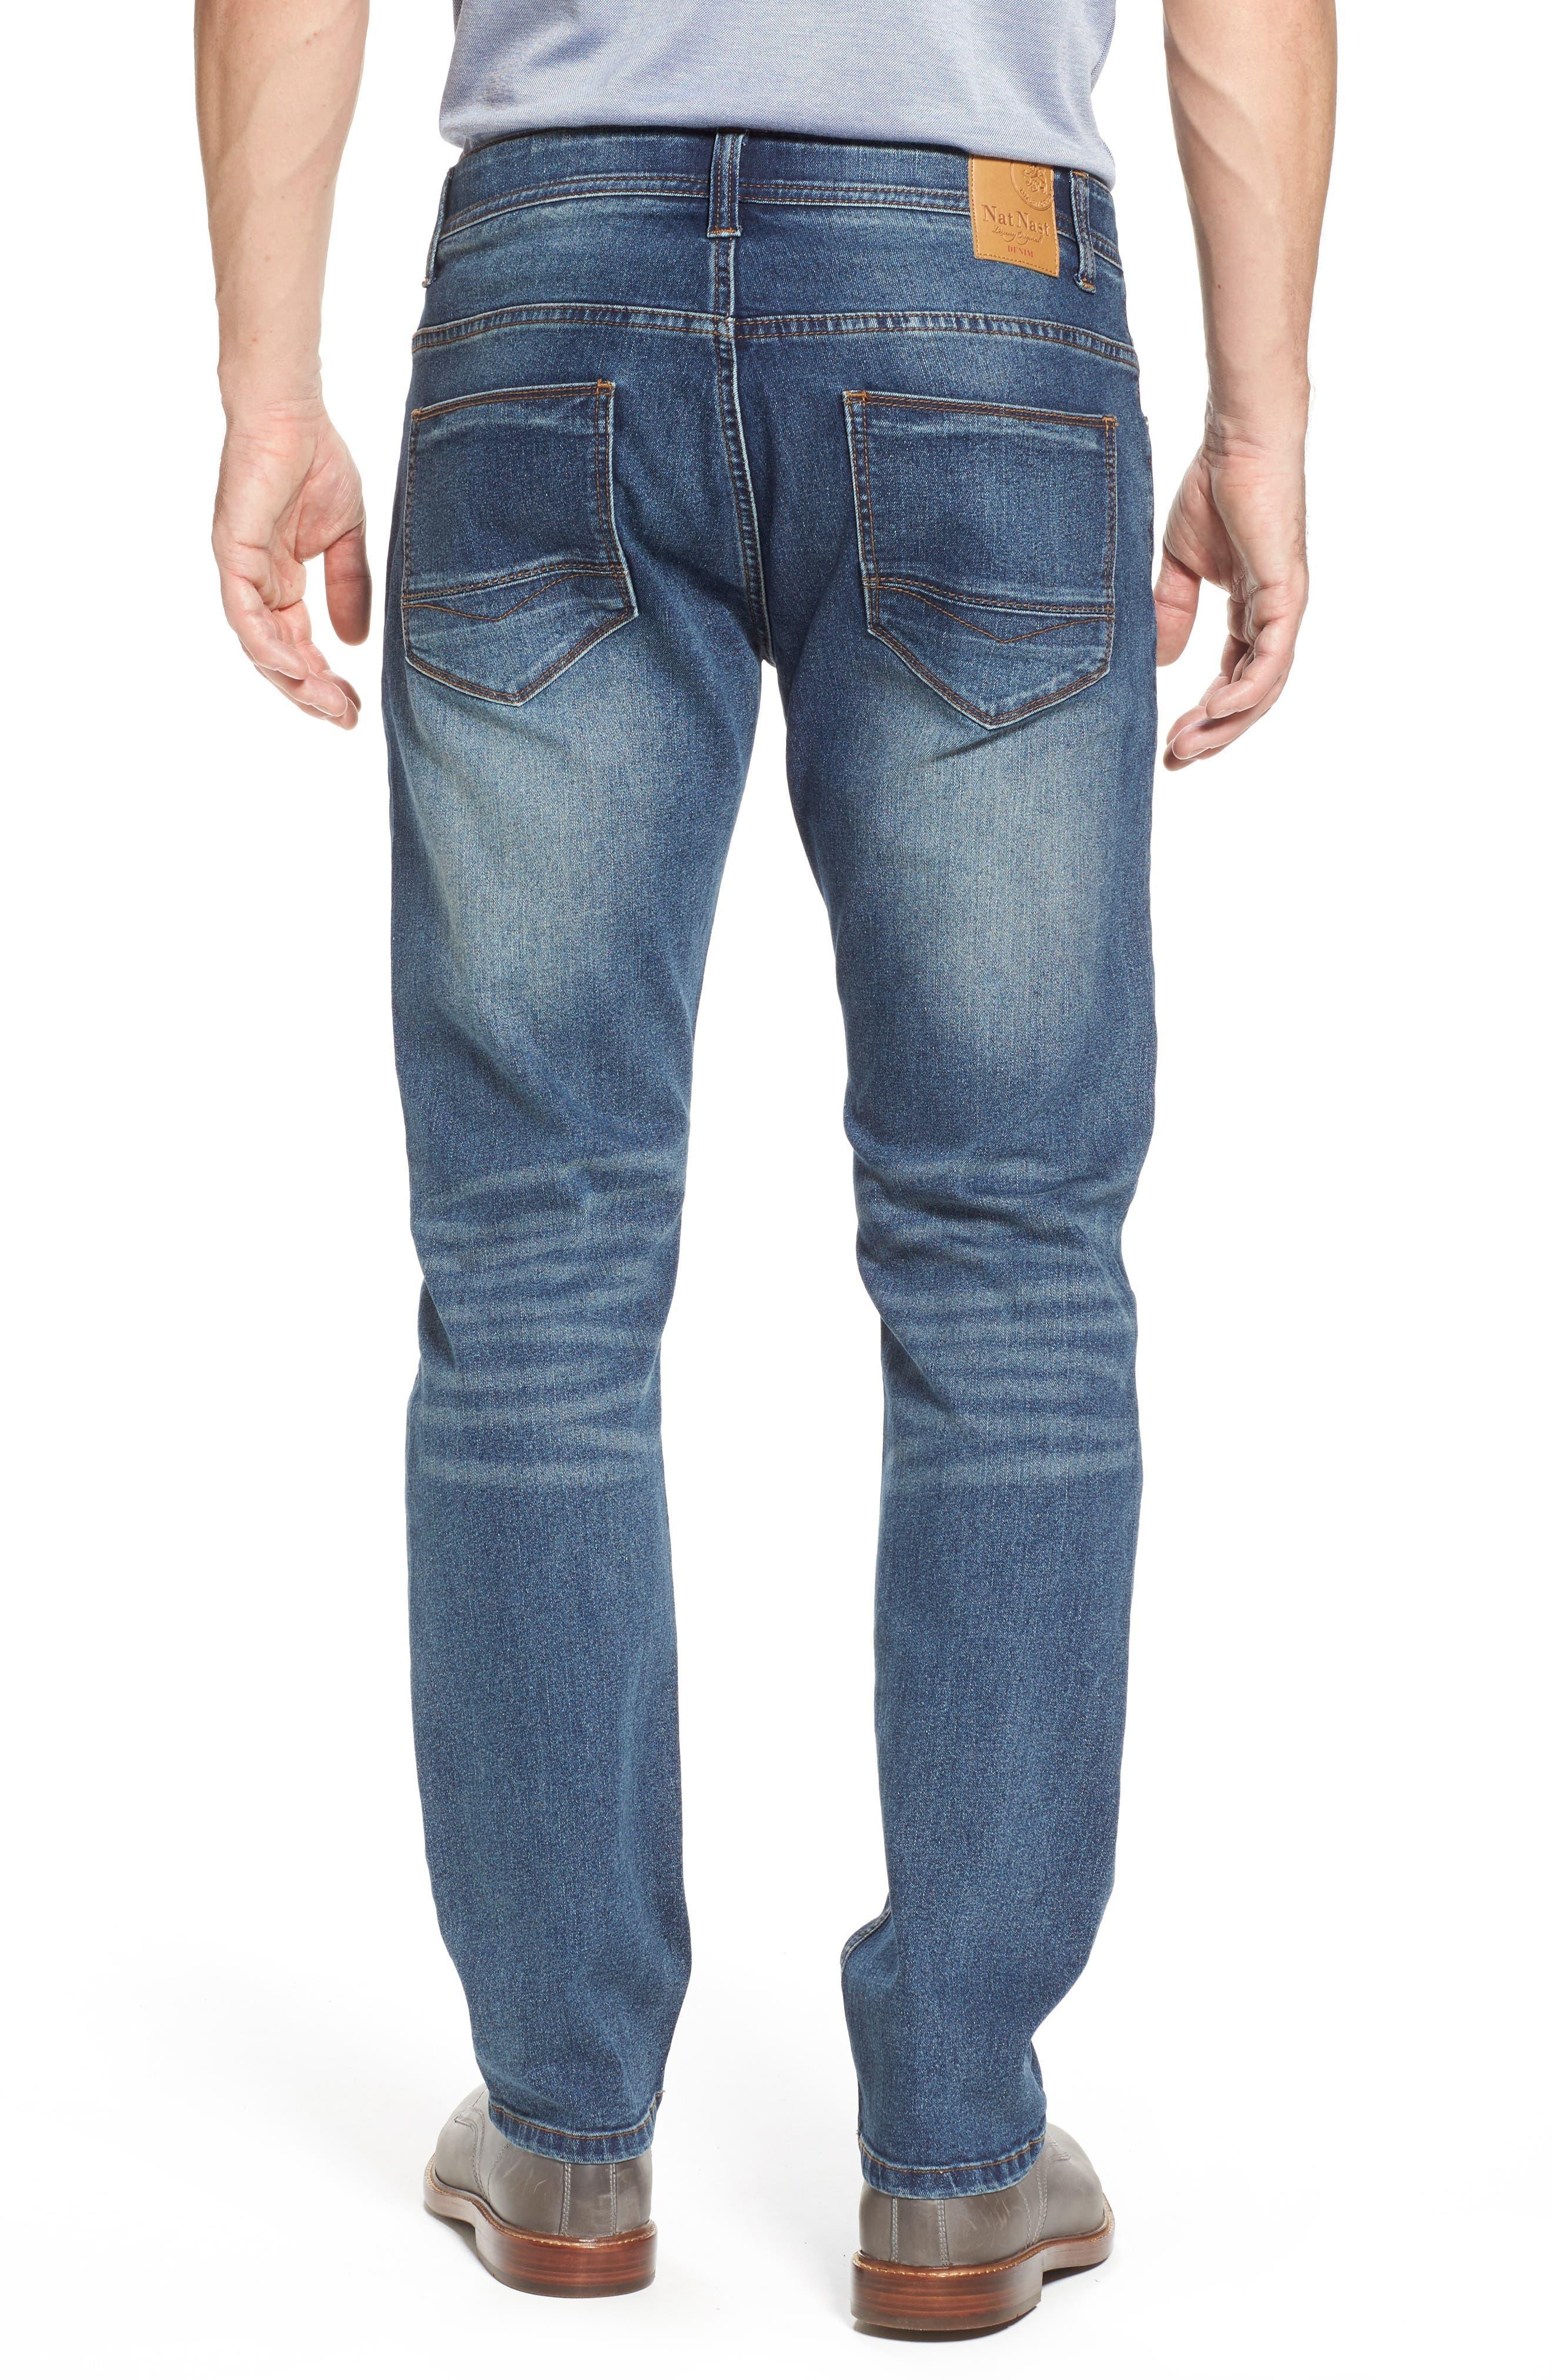 Maverick Stretch Slim Fit Jeans,                             Alternate thumbnail 2, color,                             MAVERICK WASH